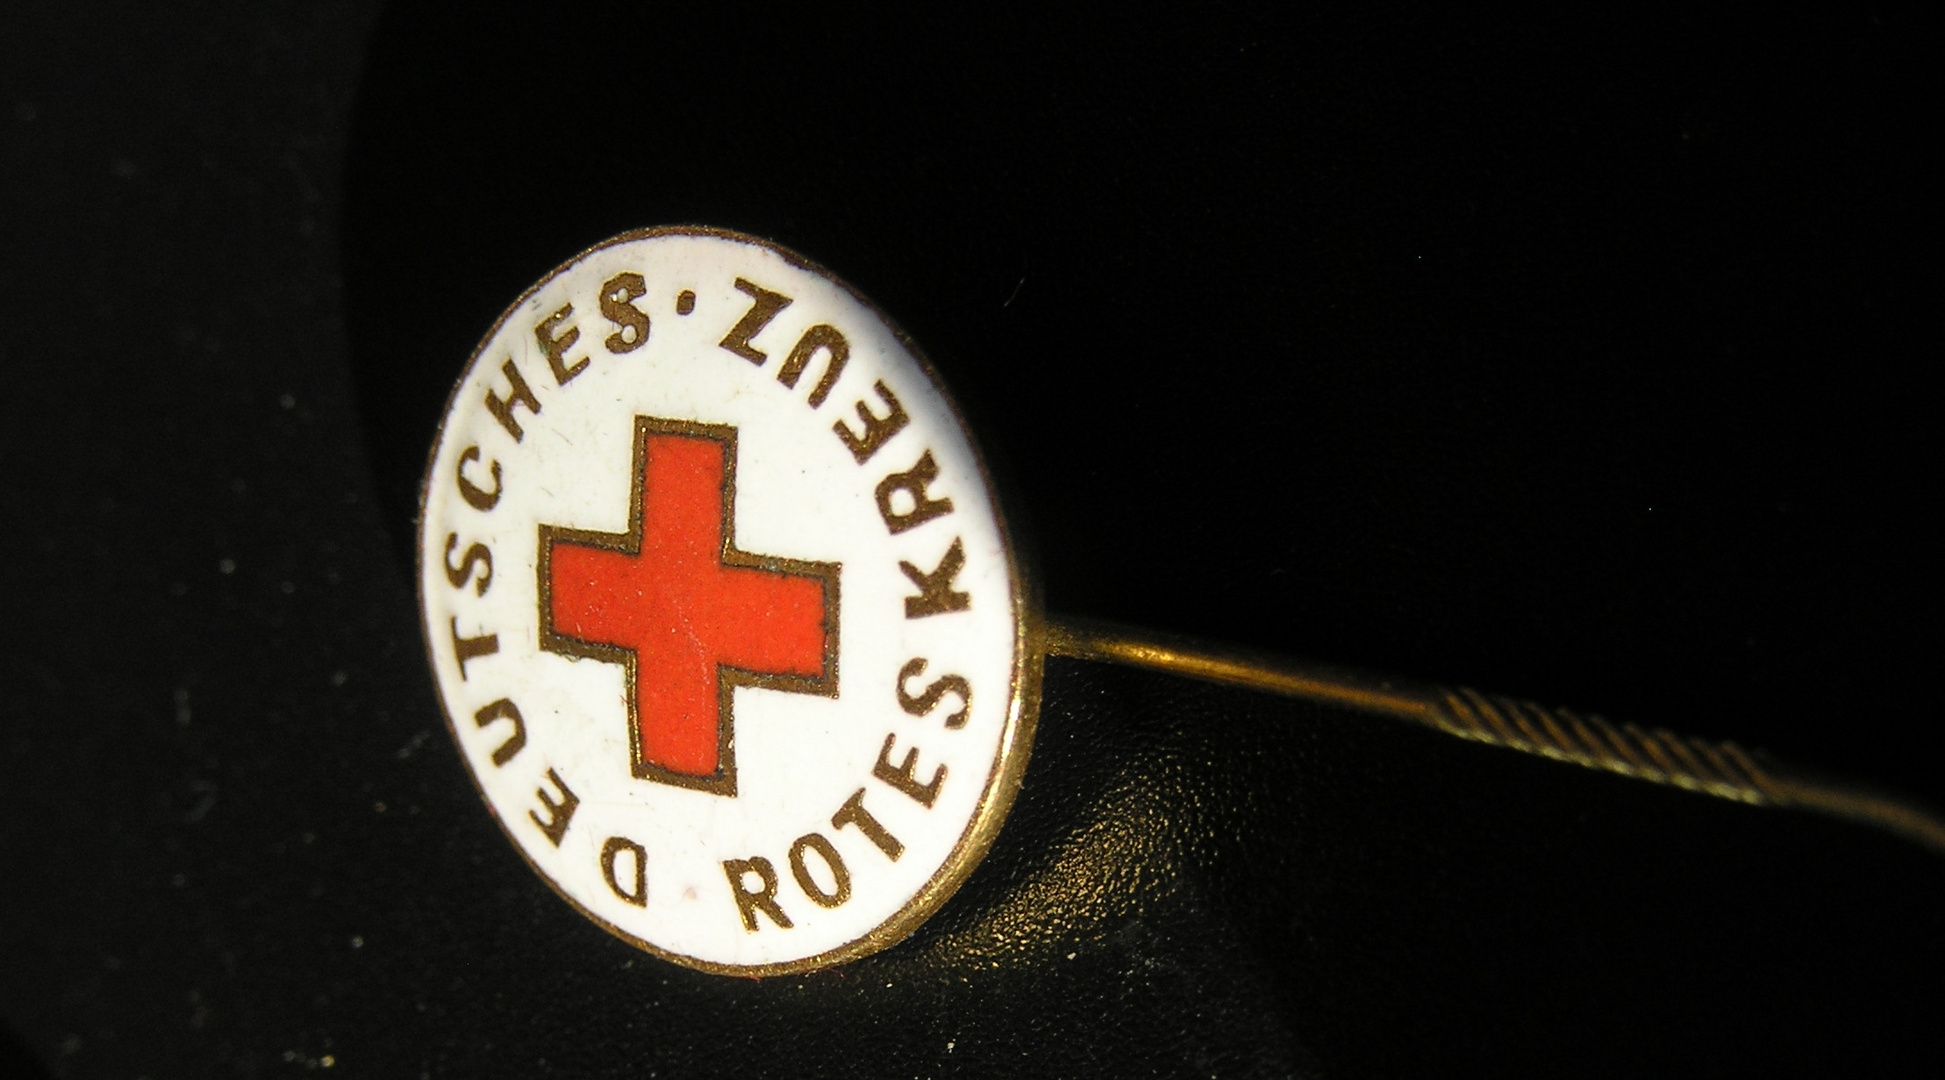 Rotes Kreuz - die Goldene